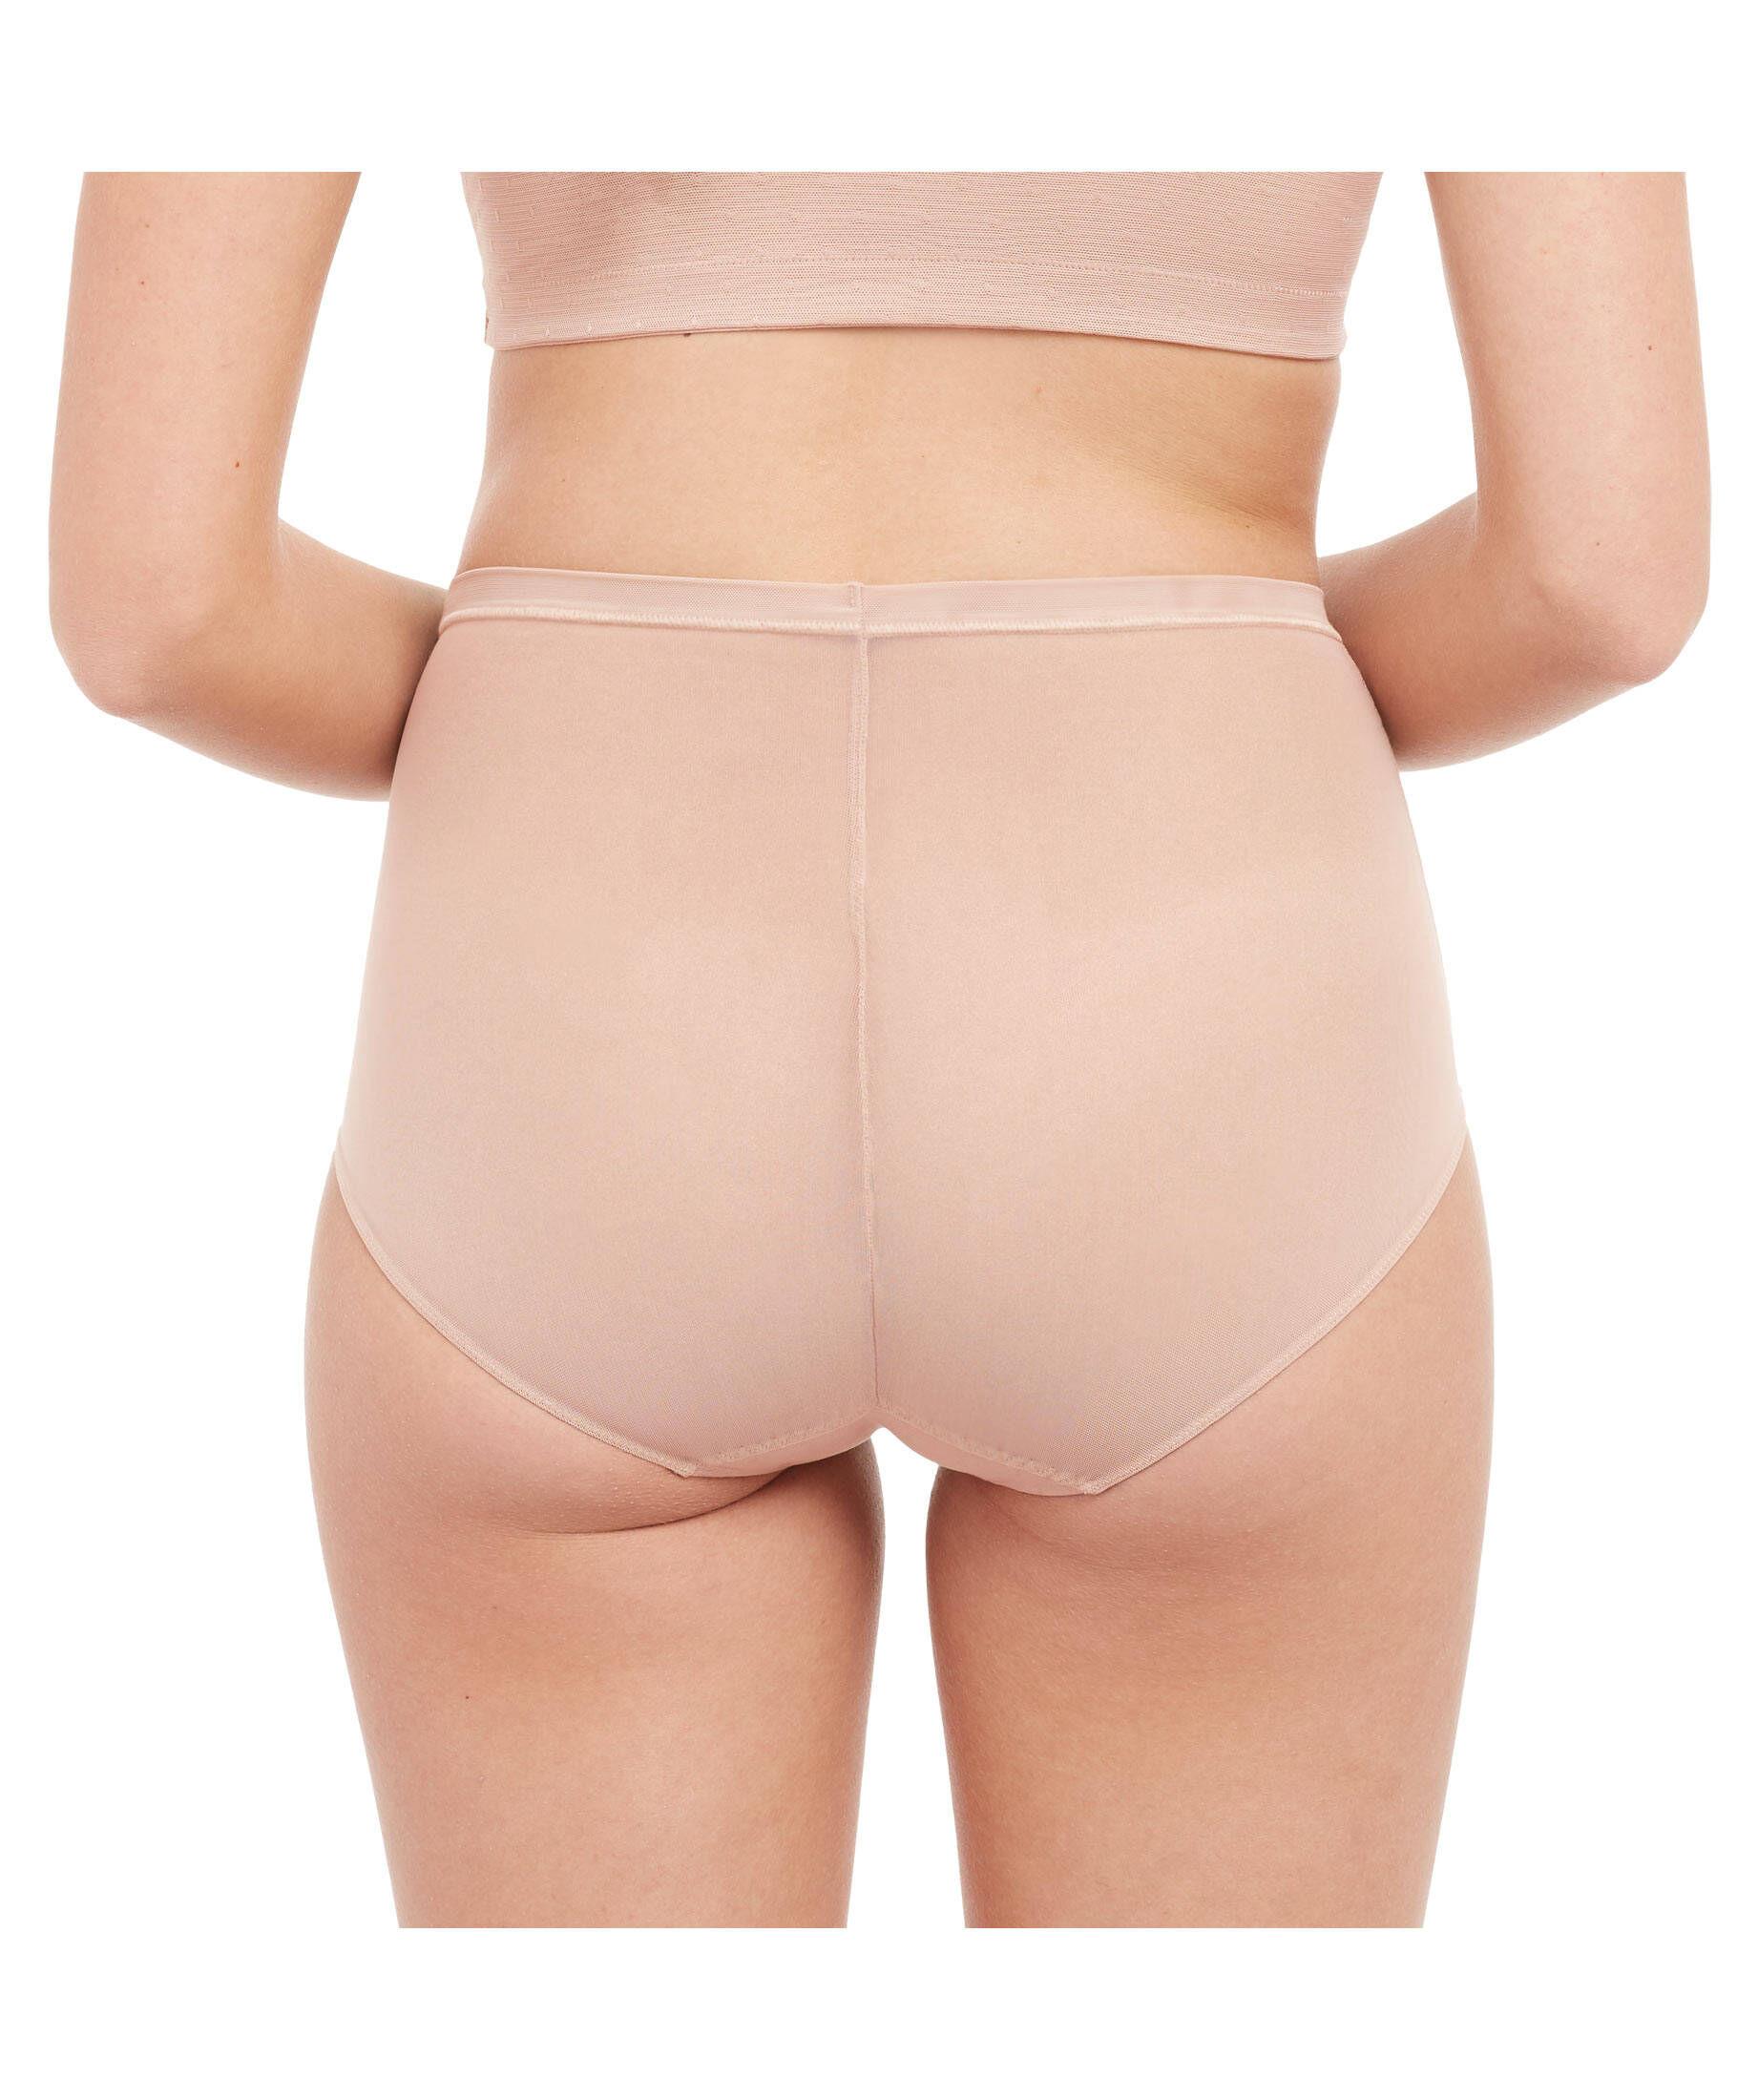 Spanx Damen Panties